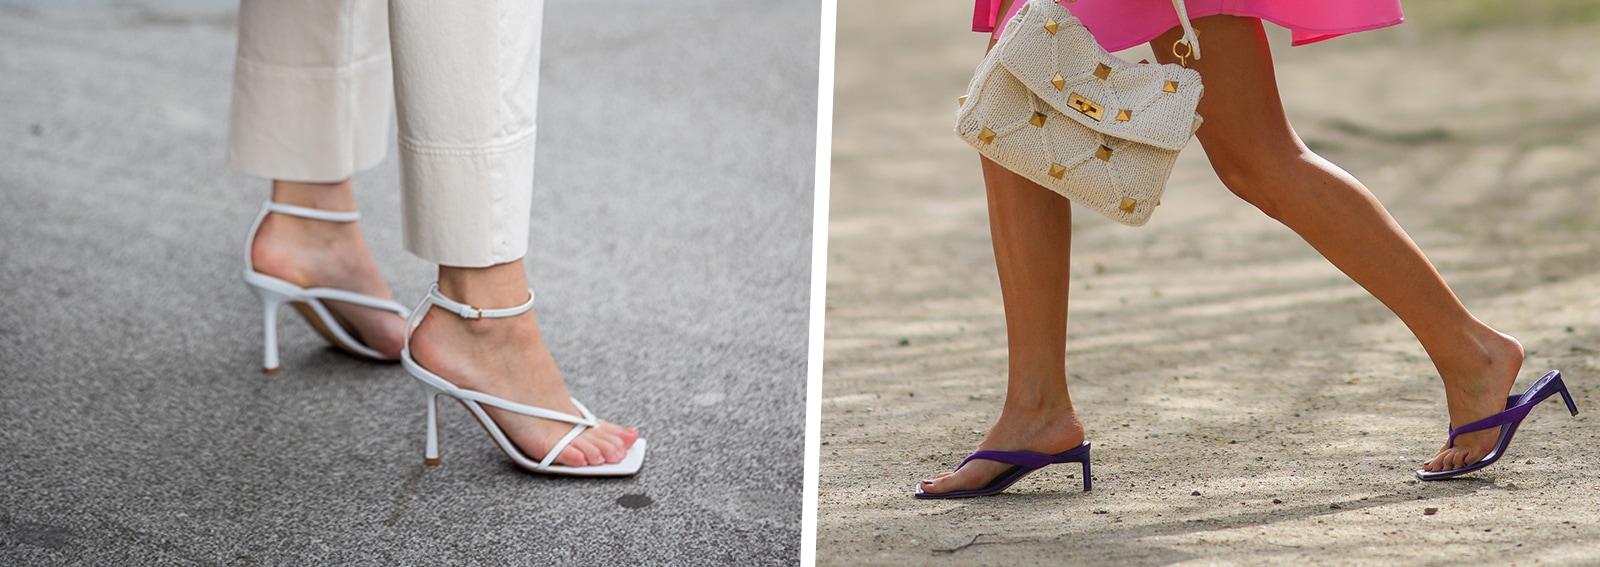 infradito con tacco tendenze moda